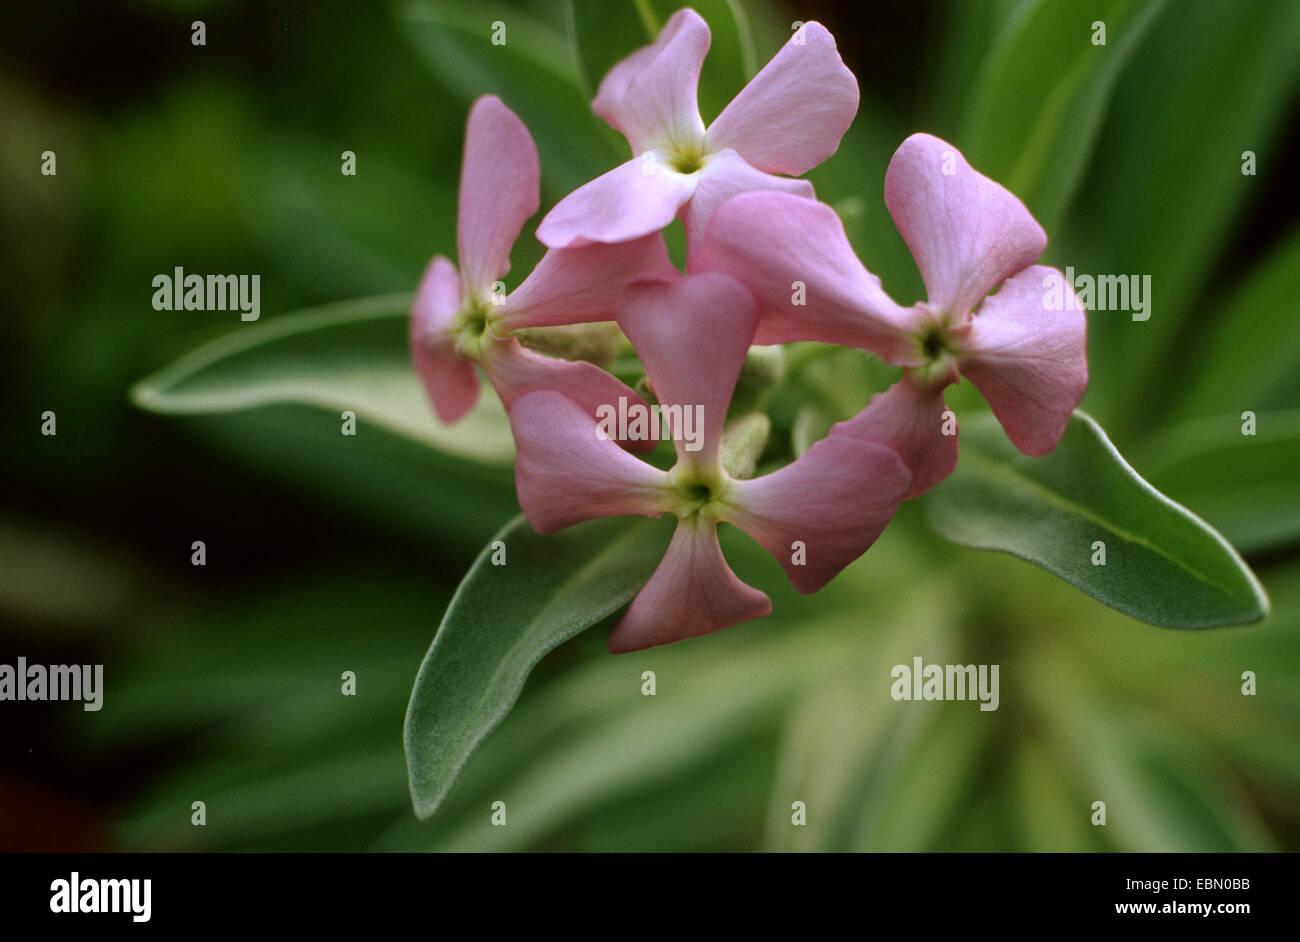 Madeira stock (Matthiola maderensis), inflorescence - Stock Image